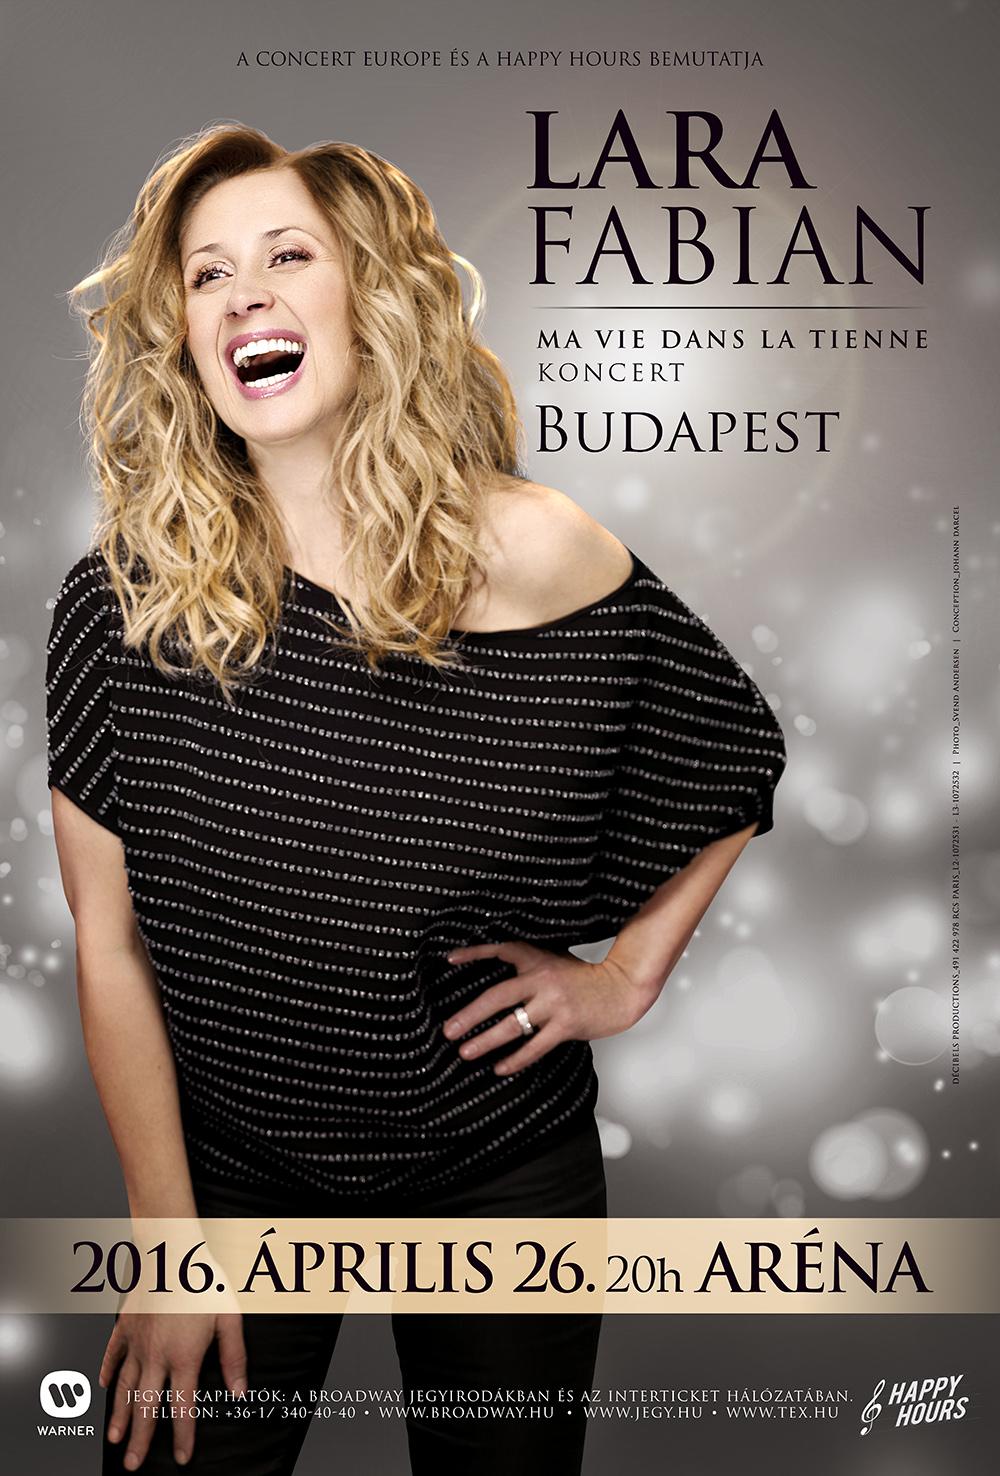 cl_1185x1750_lara_fabian_budapest_nezokep_mod_2.jpg